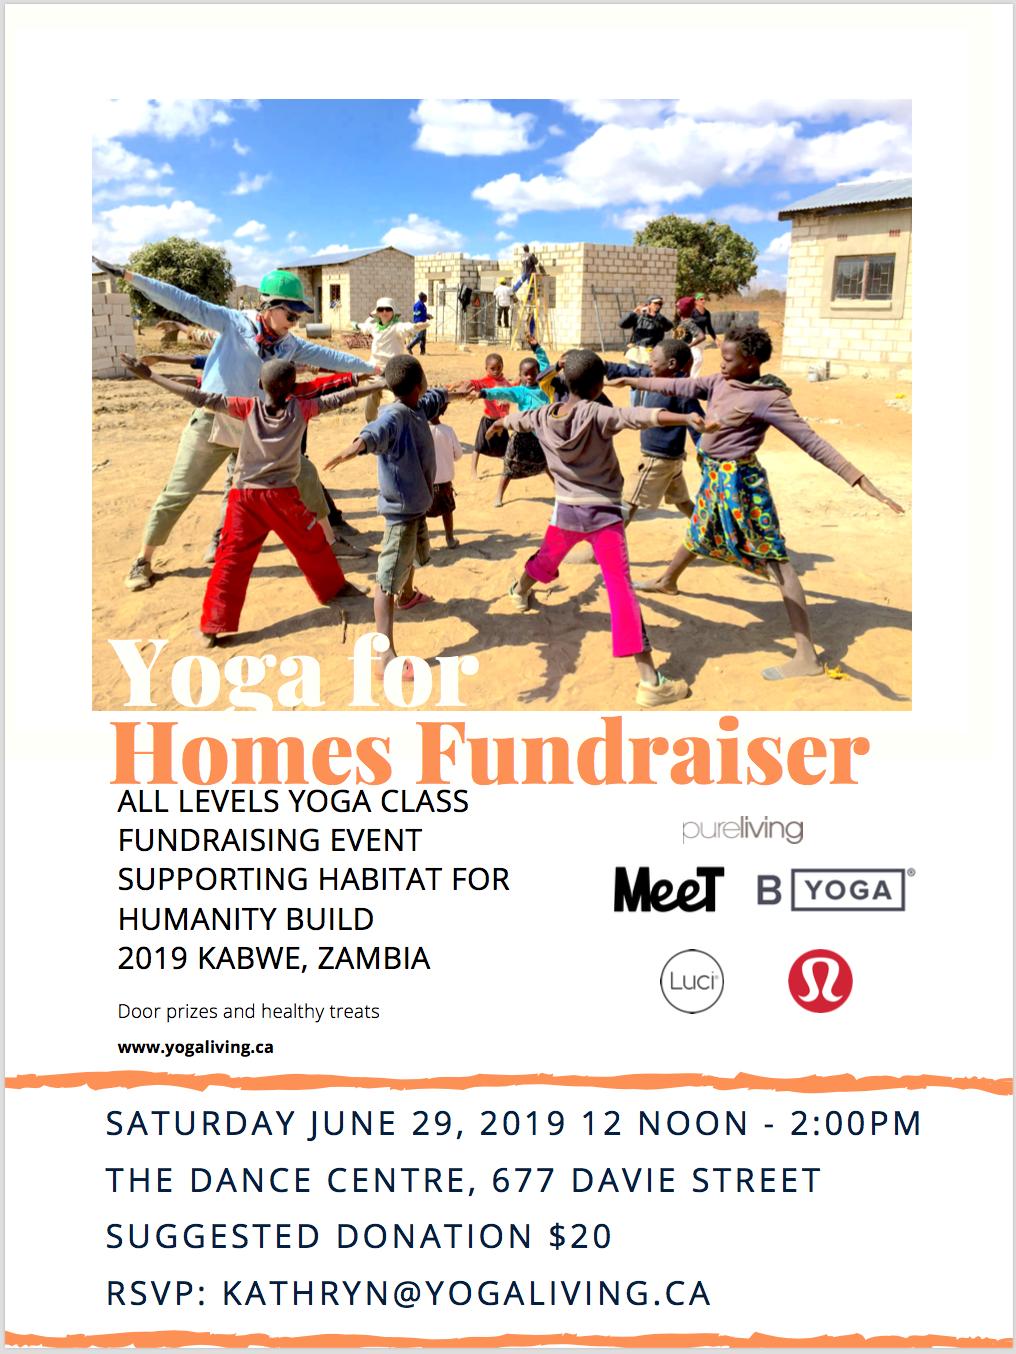 Yoga fundraiser